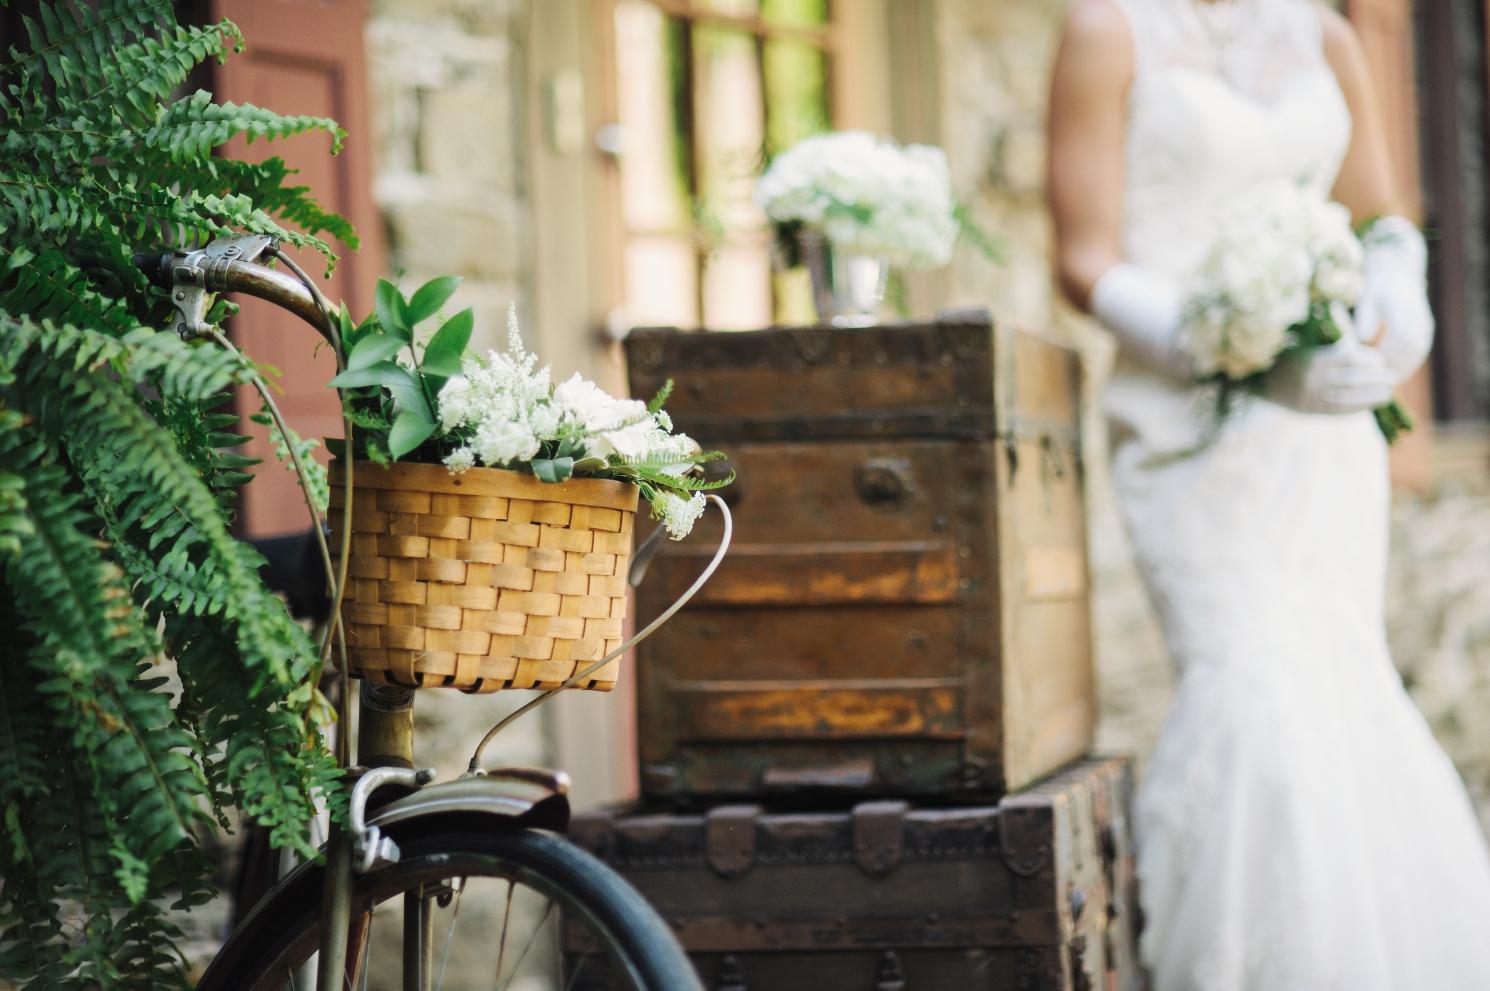 Downton Abbey Wedding Inspiration from Kimberly Brooke Photography